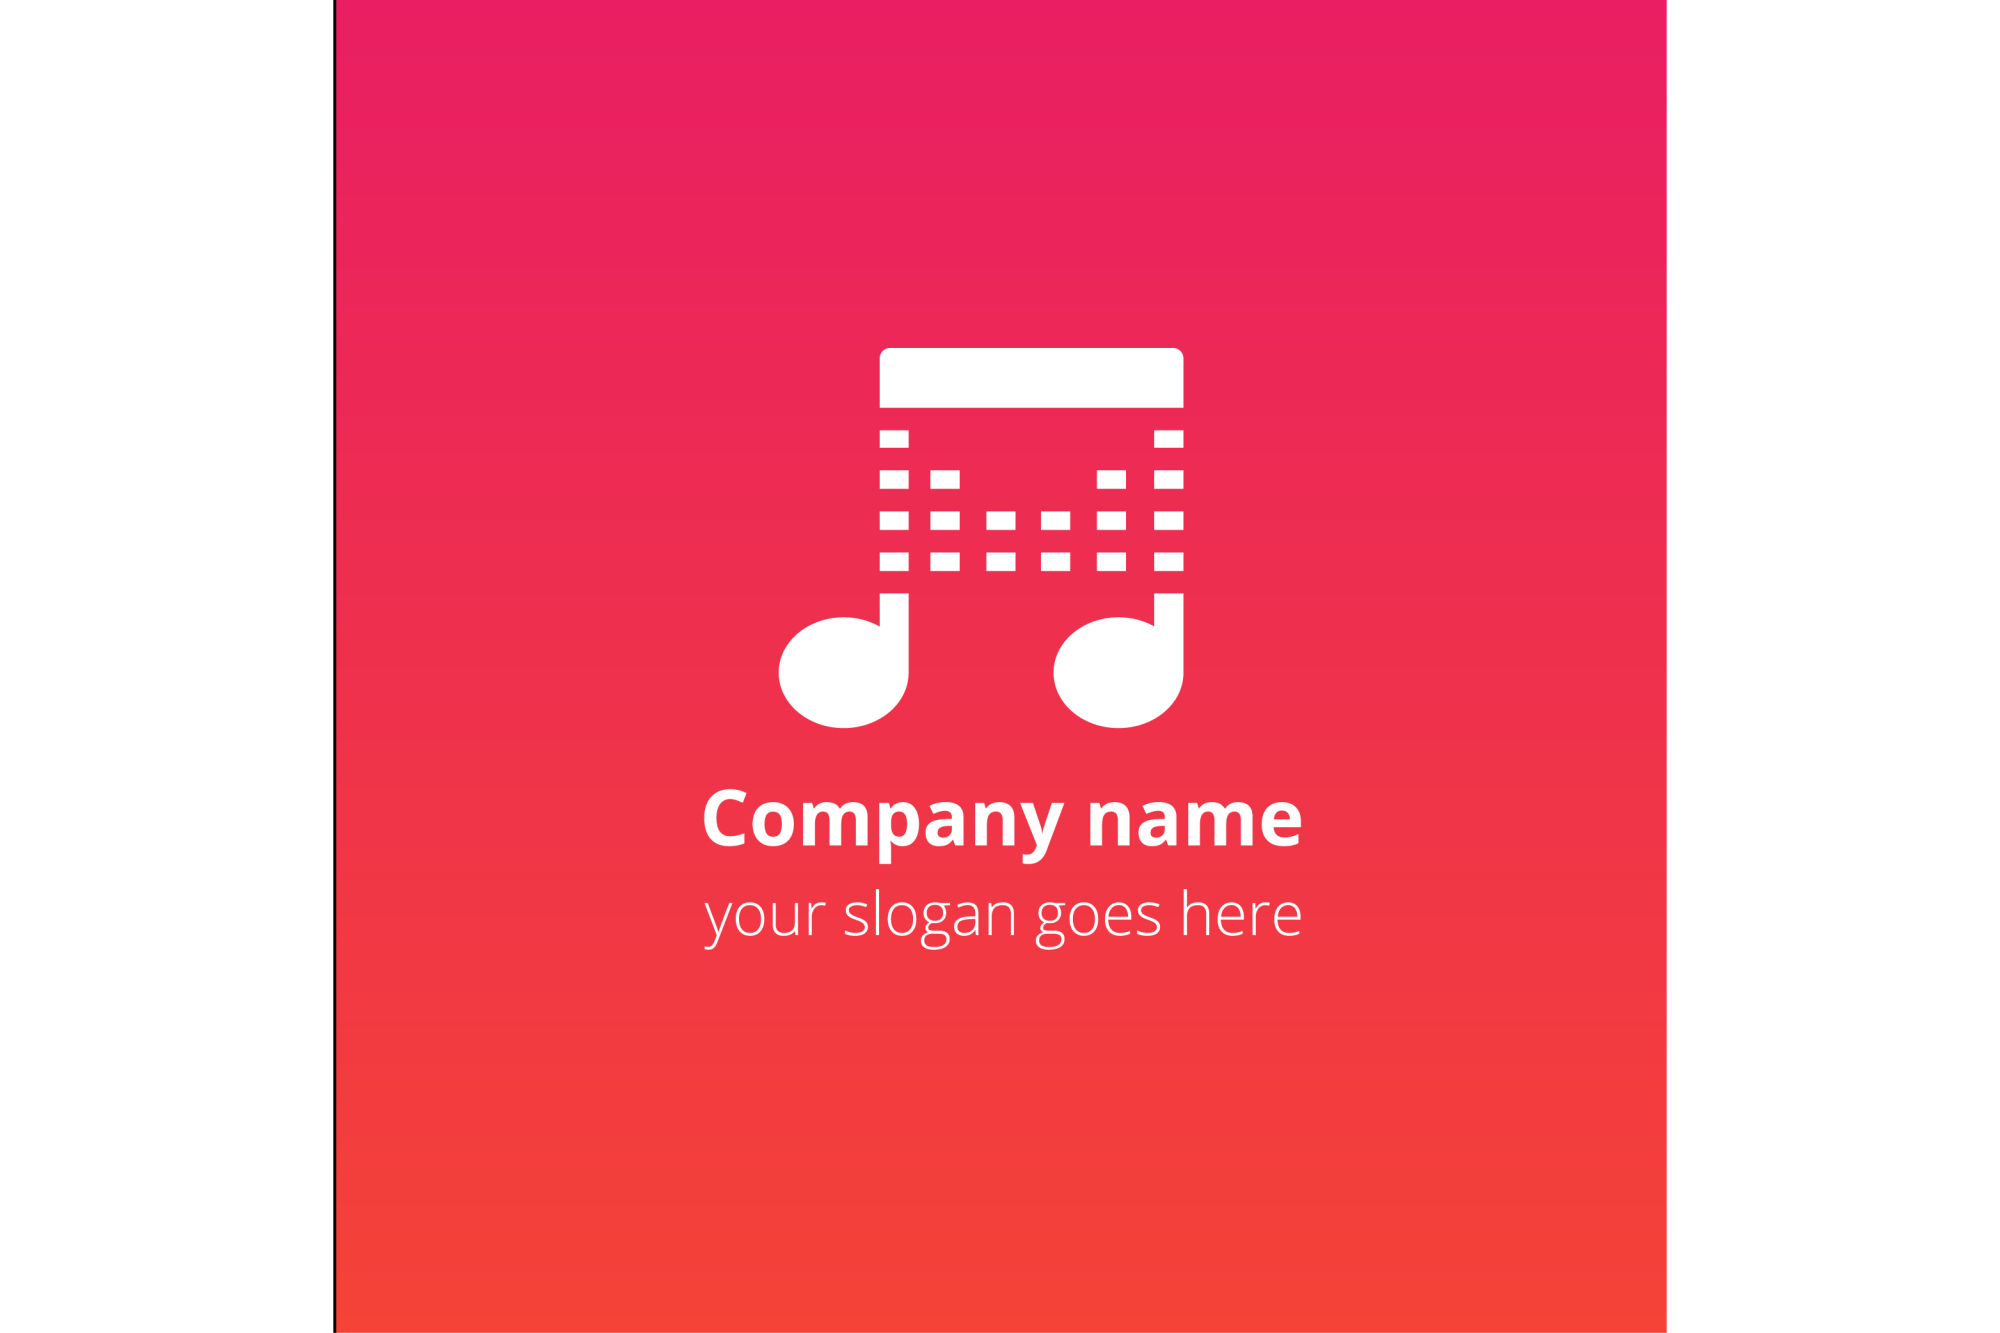 Play beats music logo example image 4